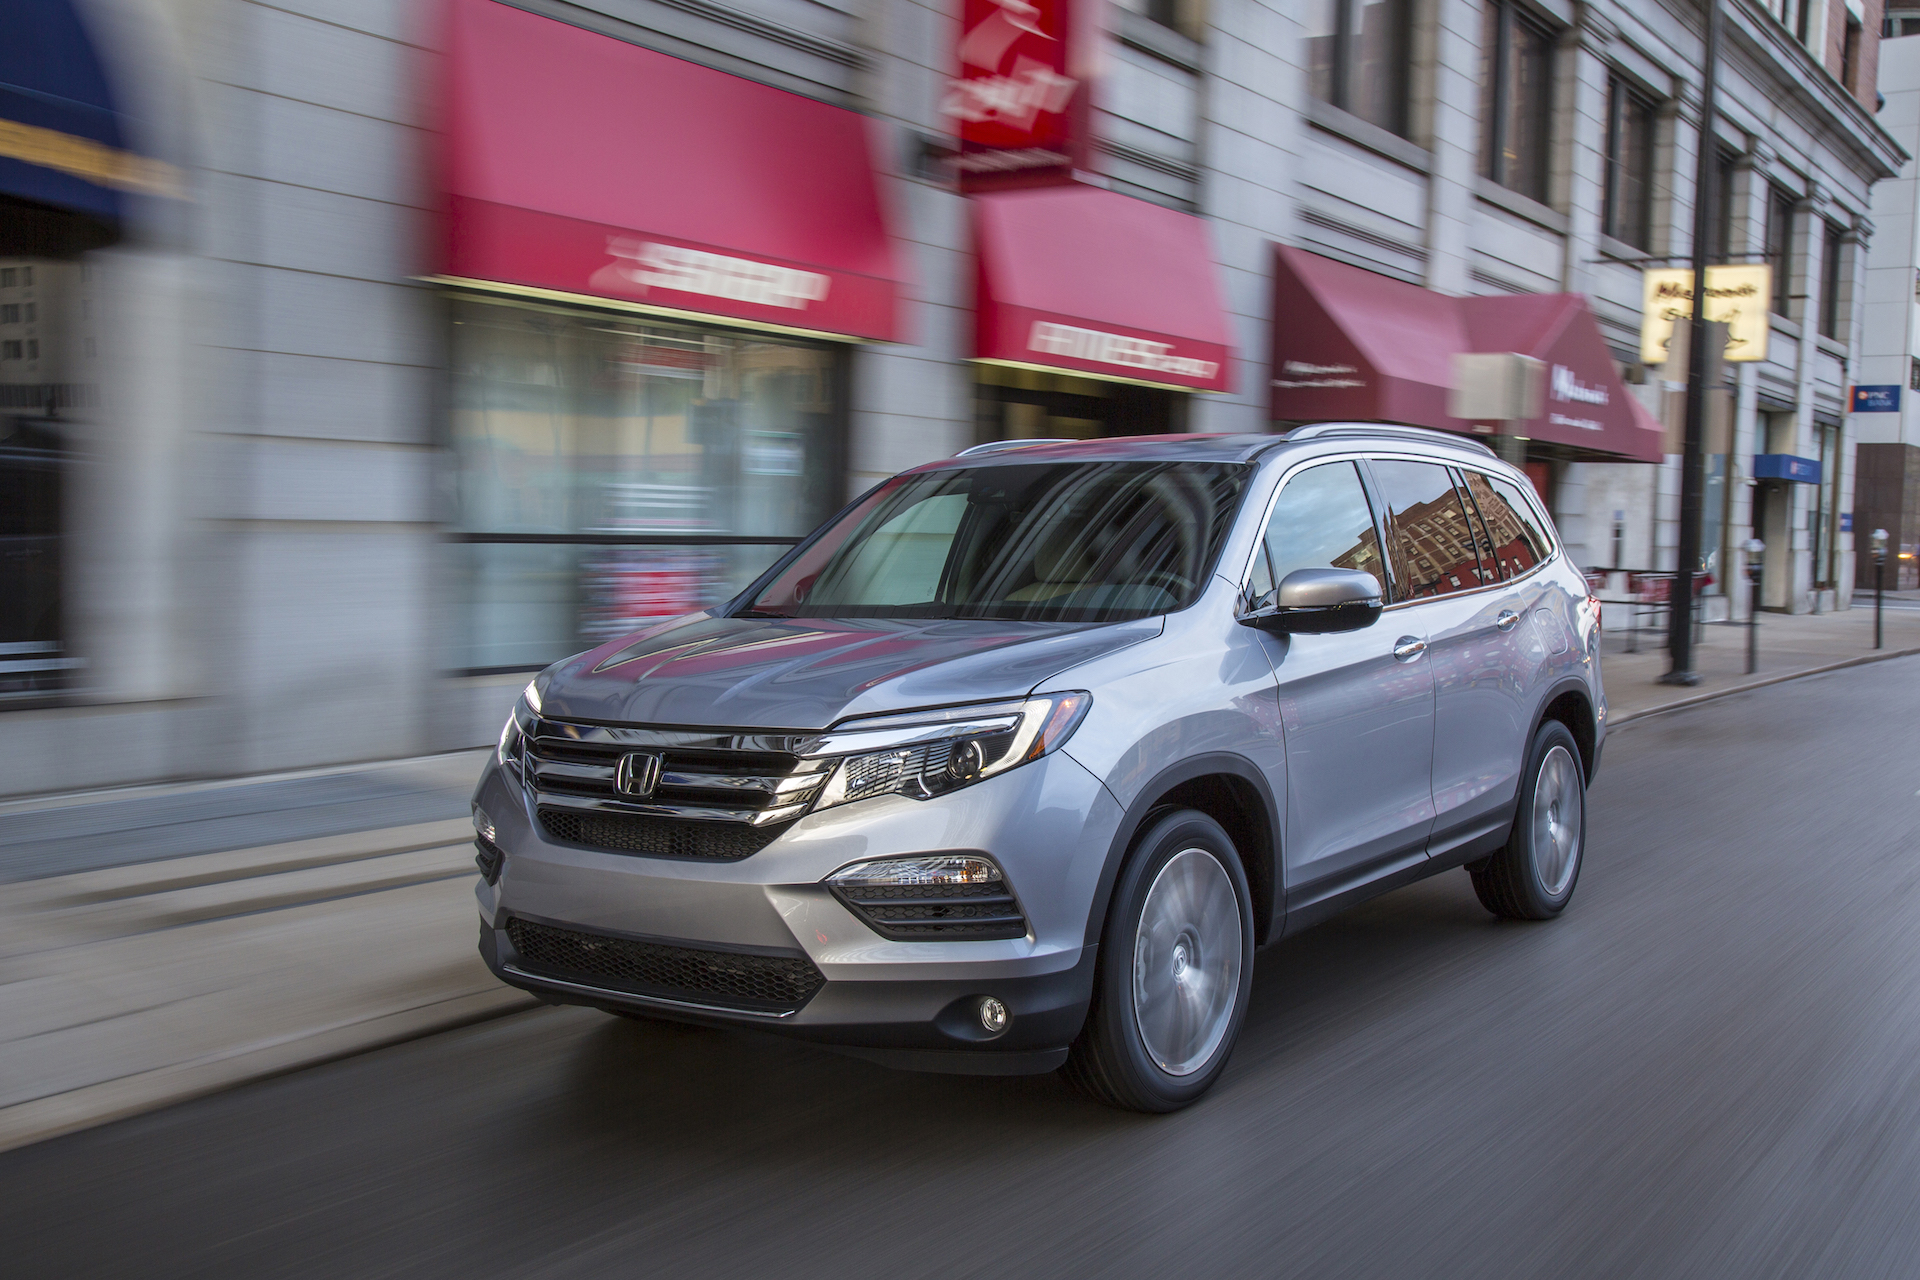 2018 Honda Pilot Redesign >> 2018 Honda Pilot Review Ratings Specs Prices And Photos